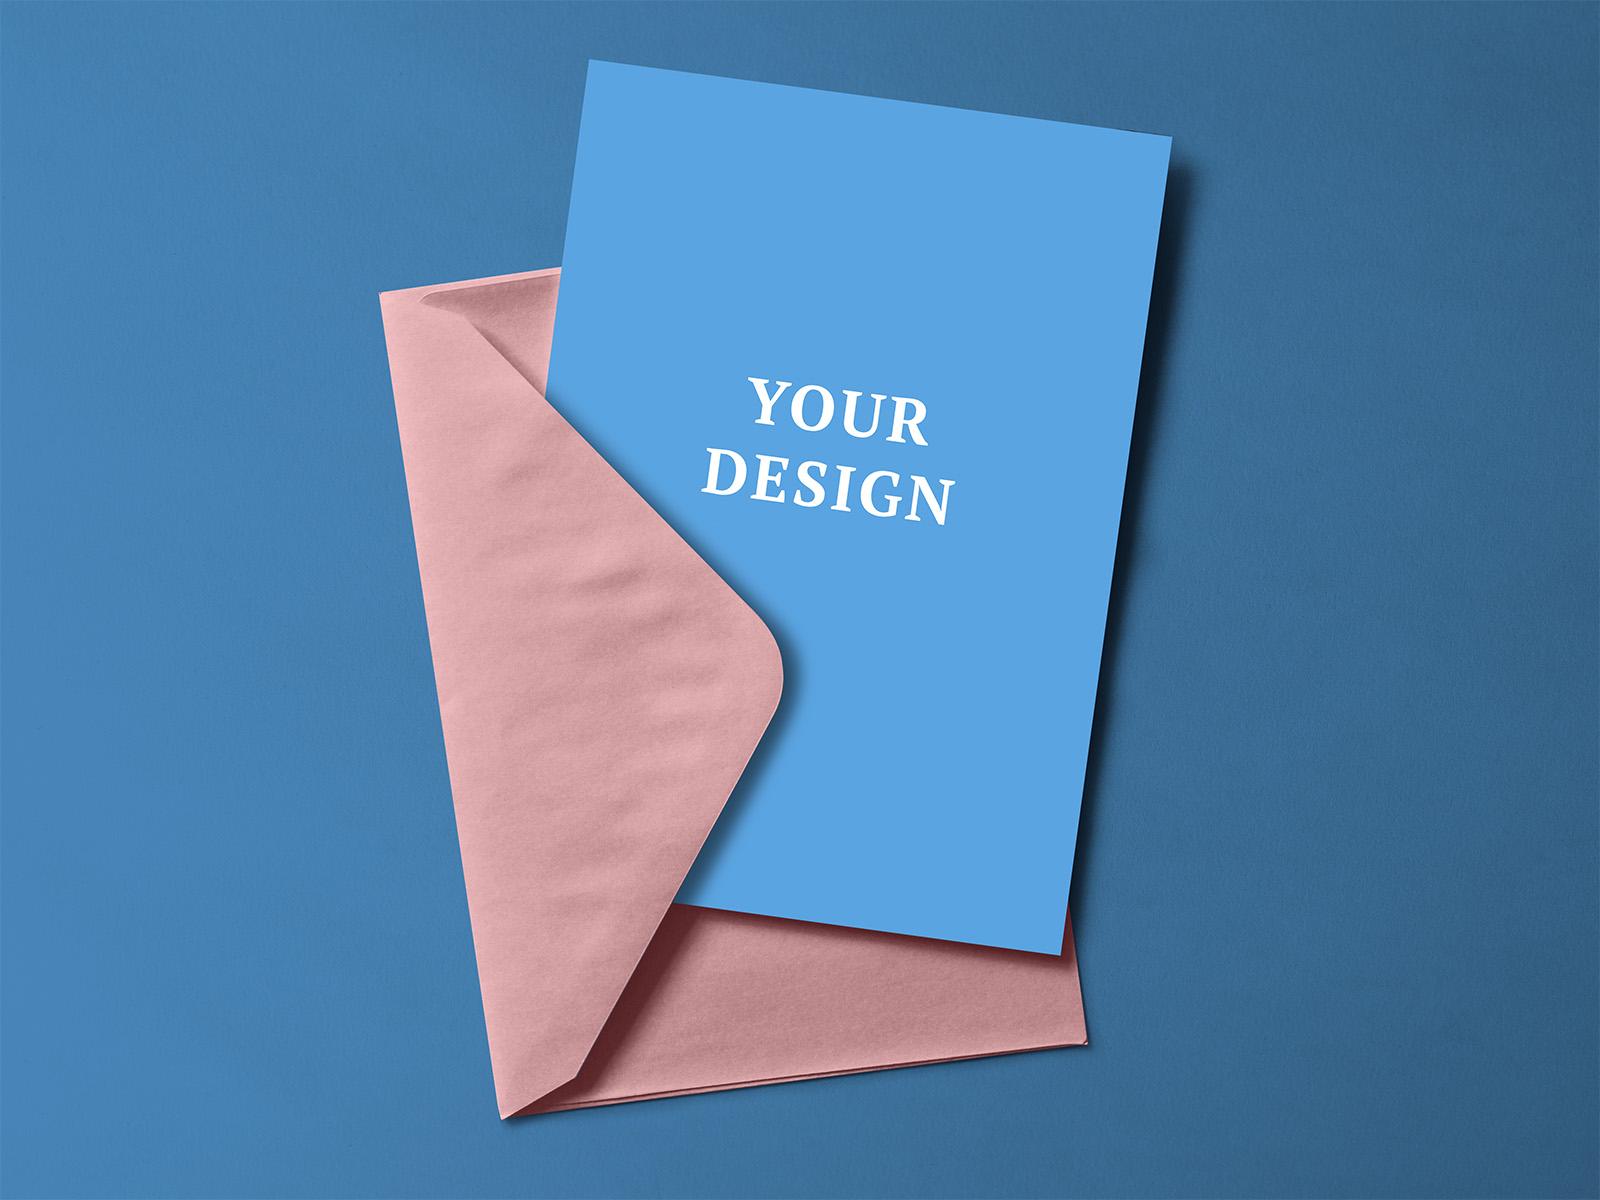 free greeting card with envelope mockup